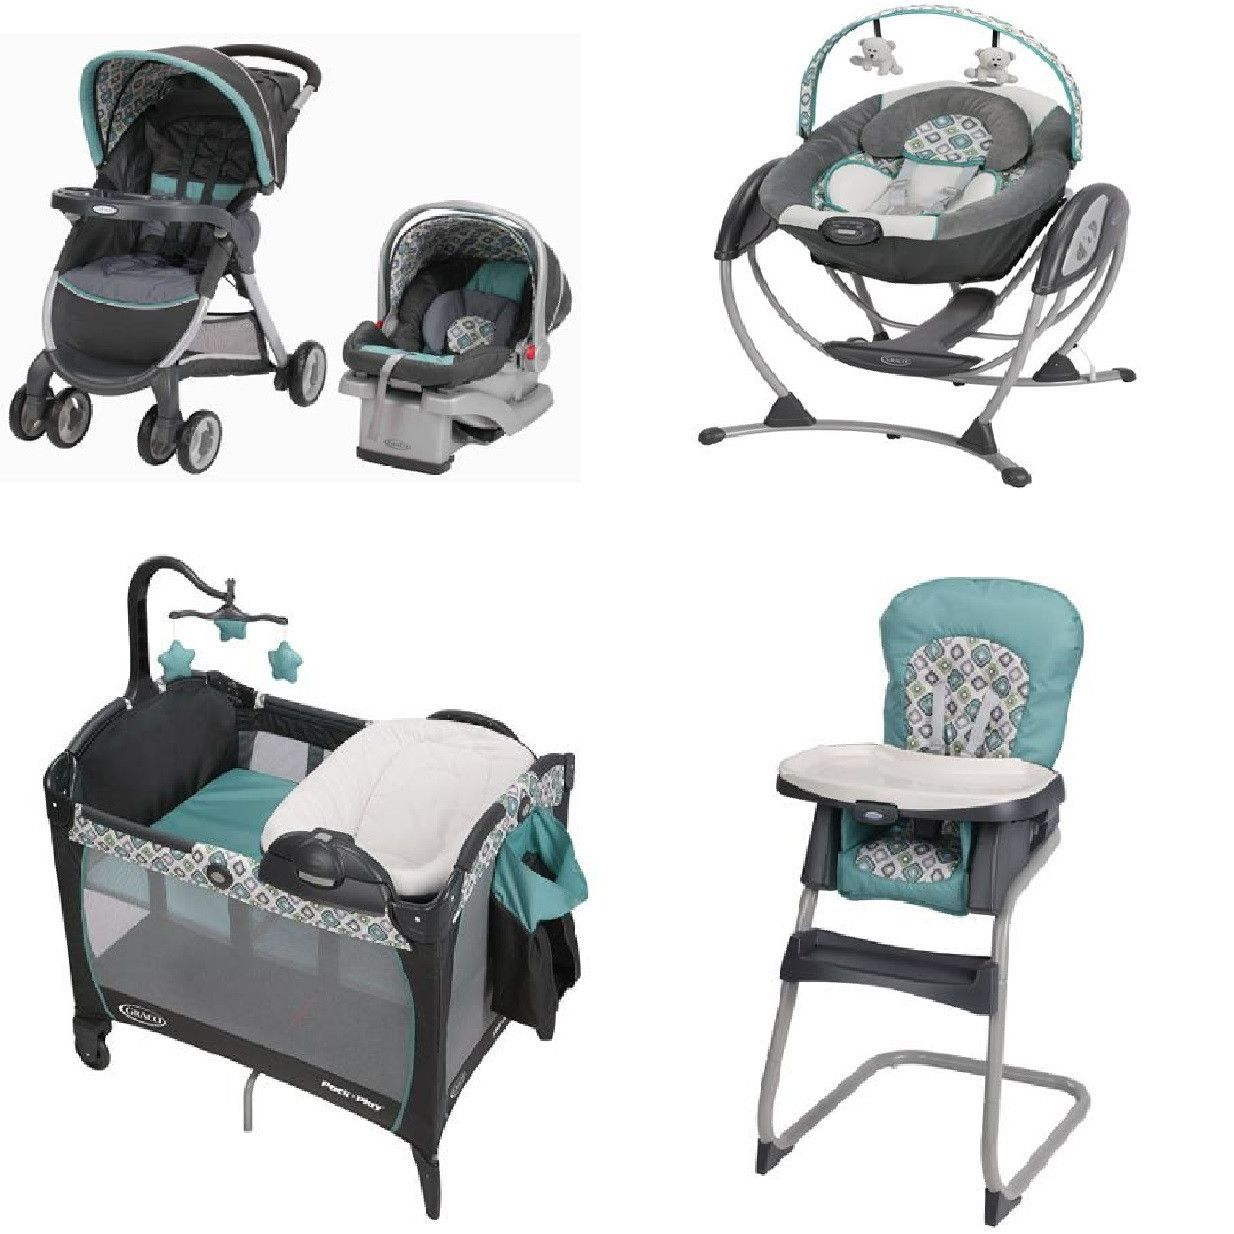 baby car seat and stroller bundles